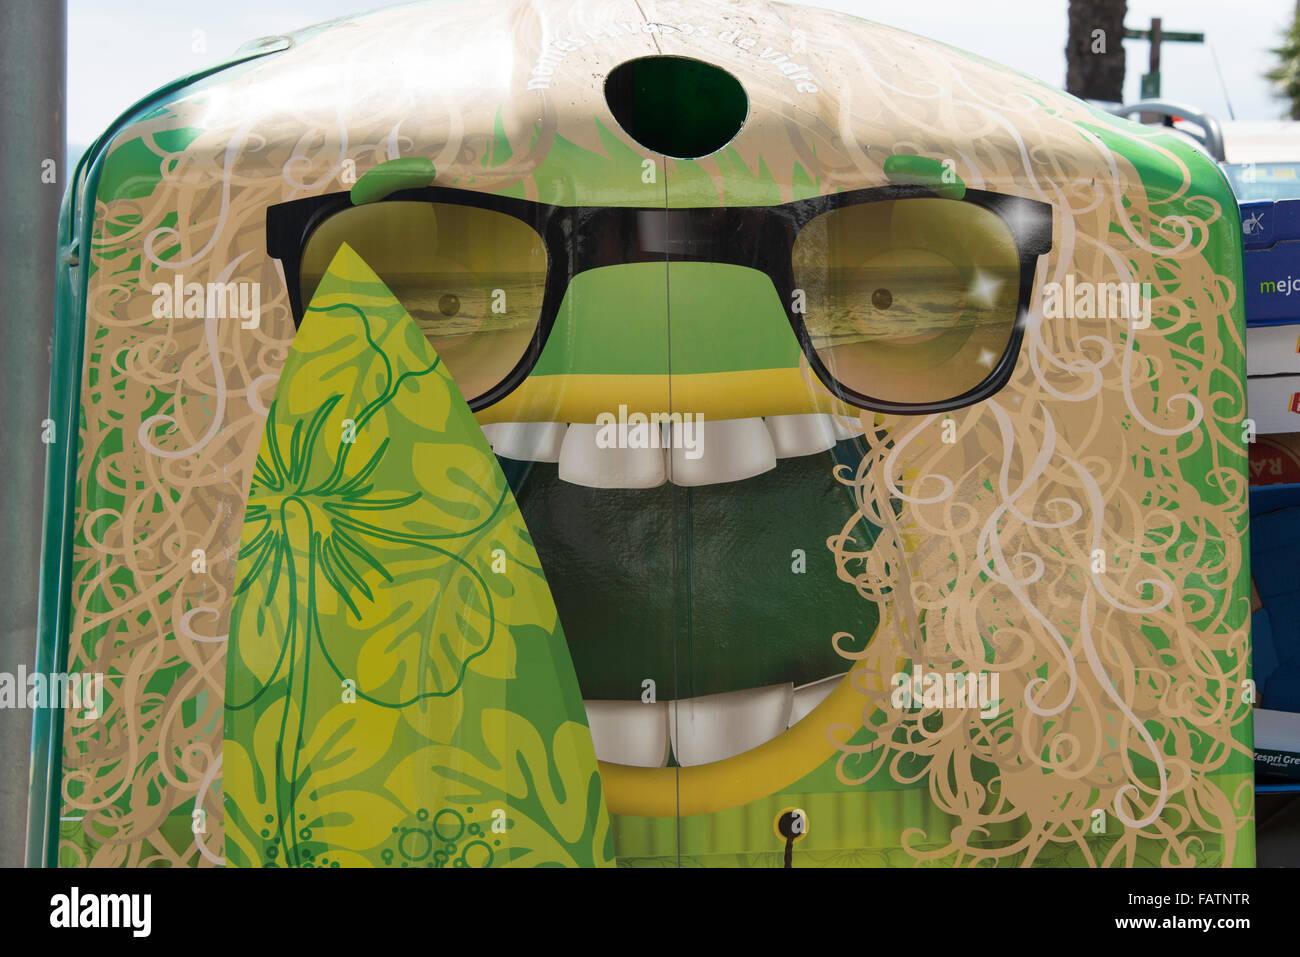 Humorvolle Gesicht Recyclingbehälter, Lloret de Mar, Costa Brava, Provinz Girona, Katalonien, Spanien Stockfoto